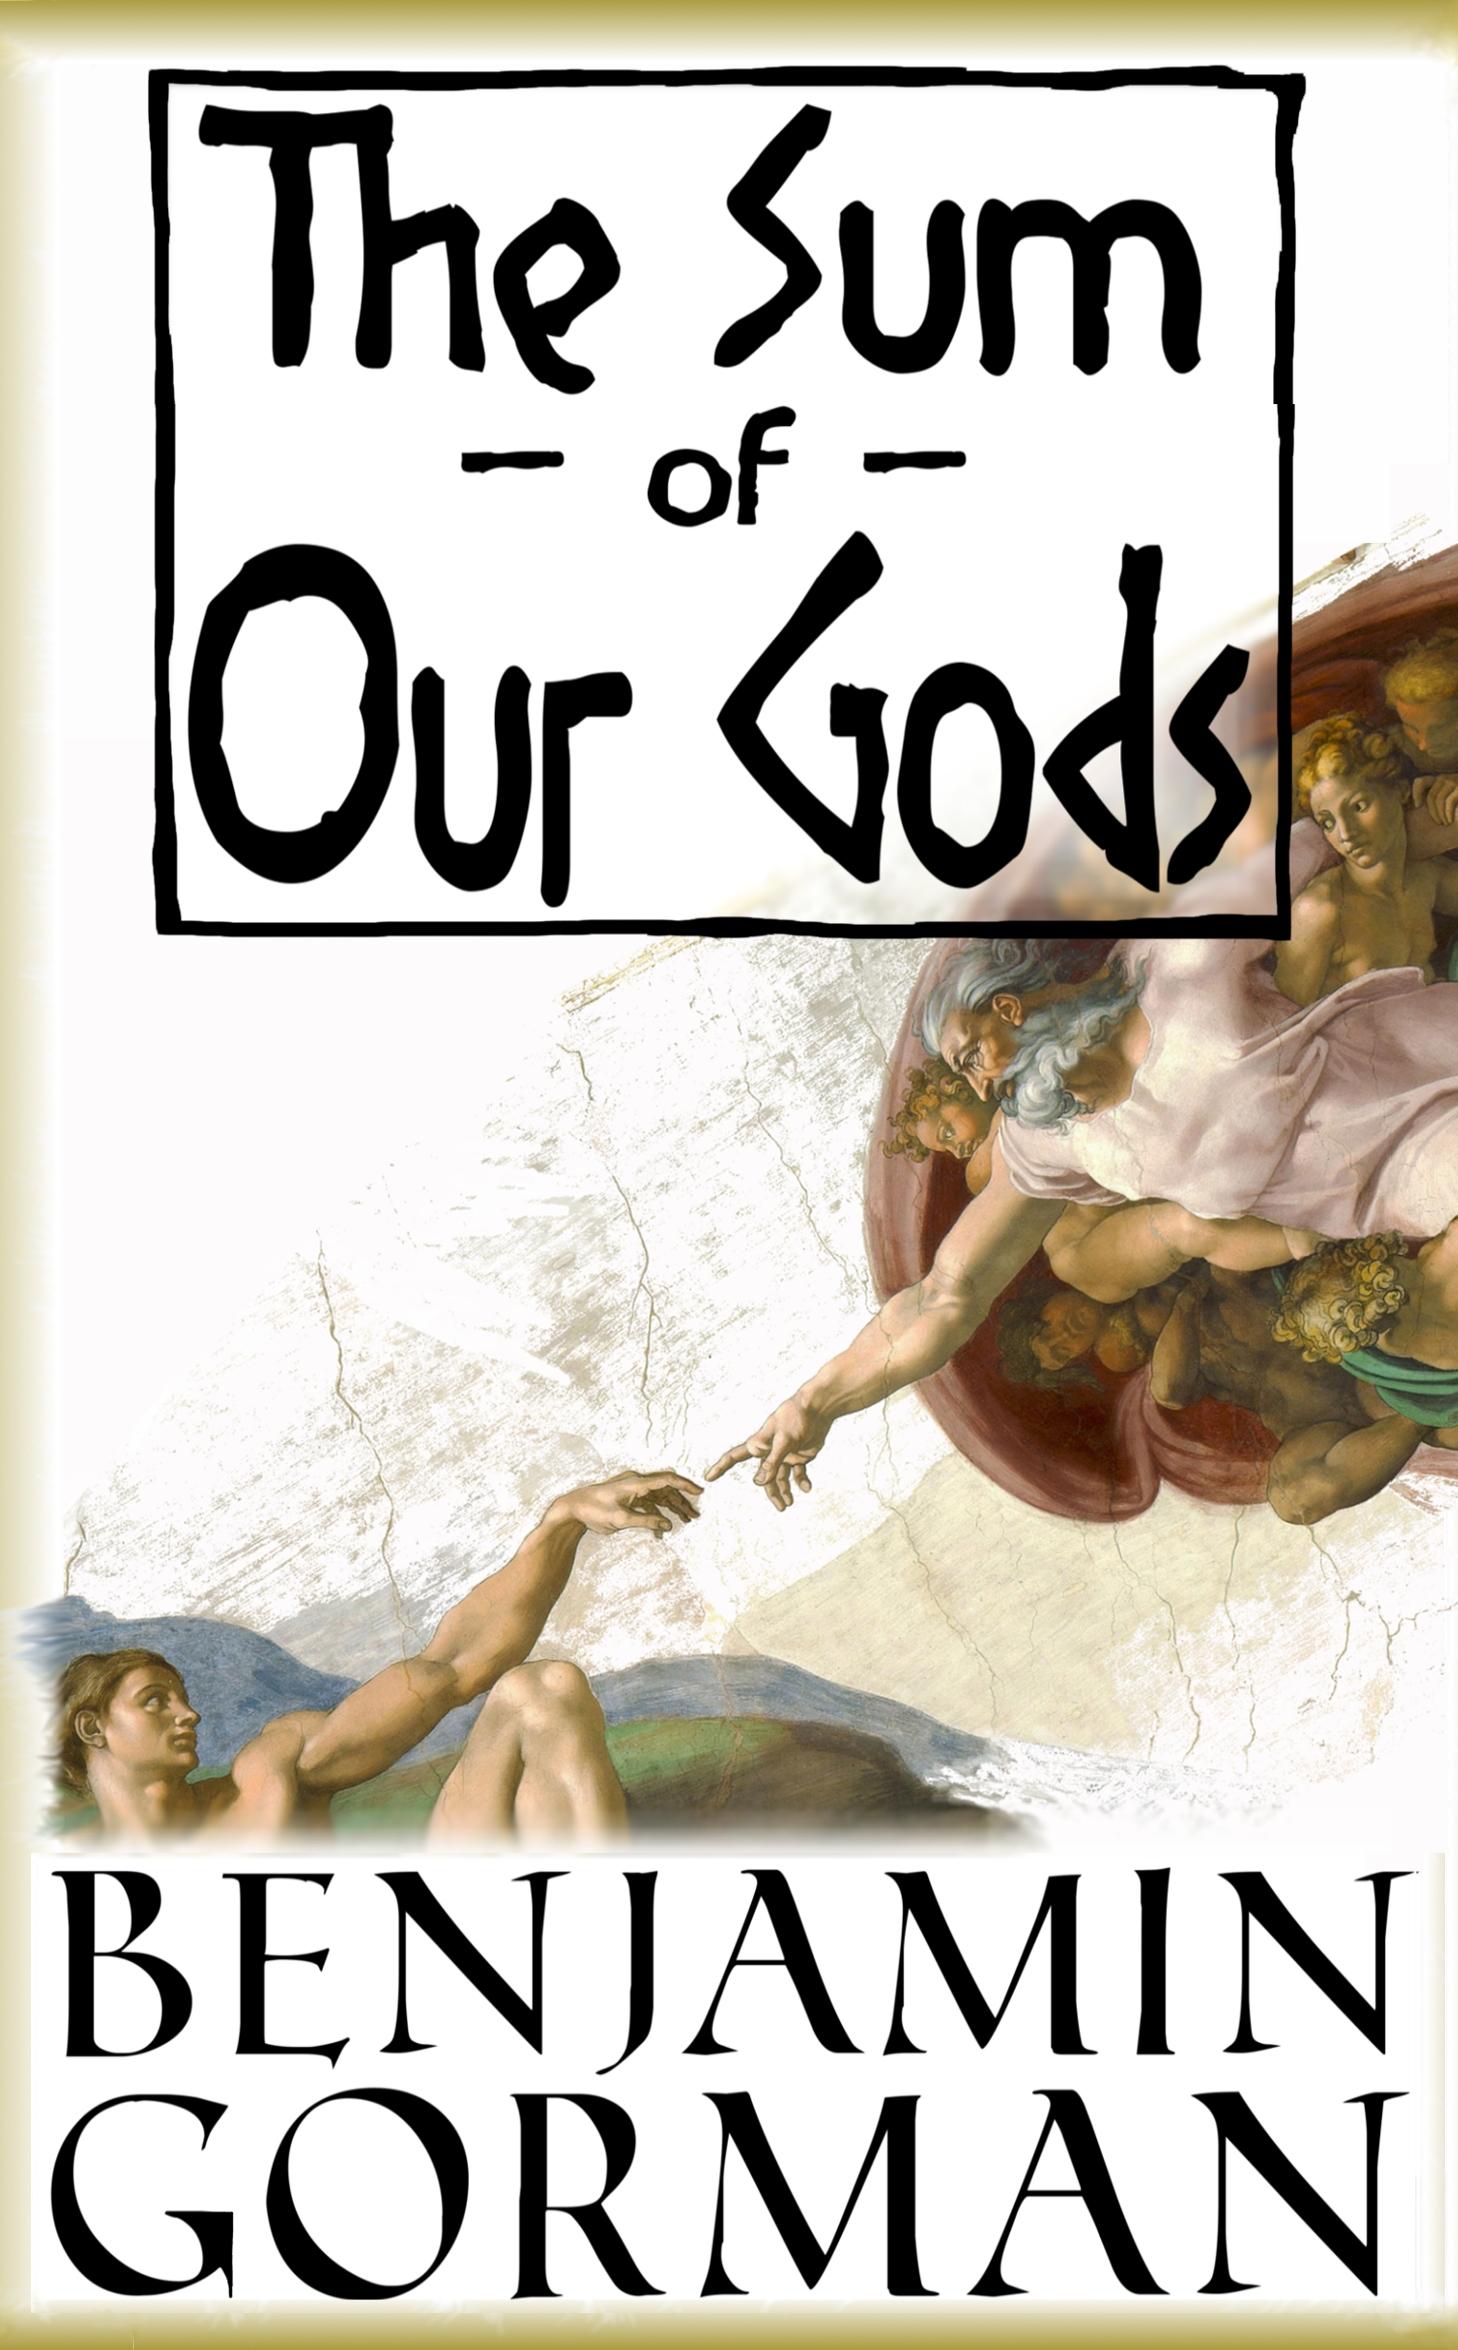 Sum of Our Gods eBook cover edit 1.jpg